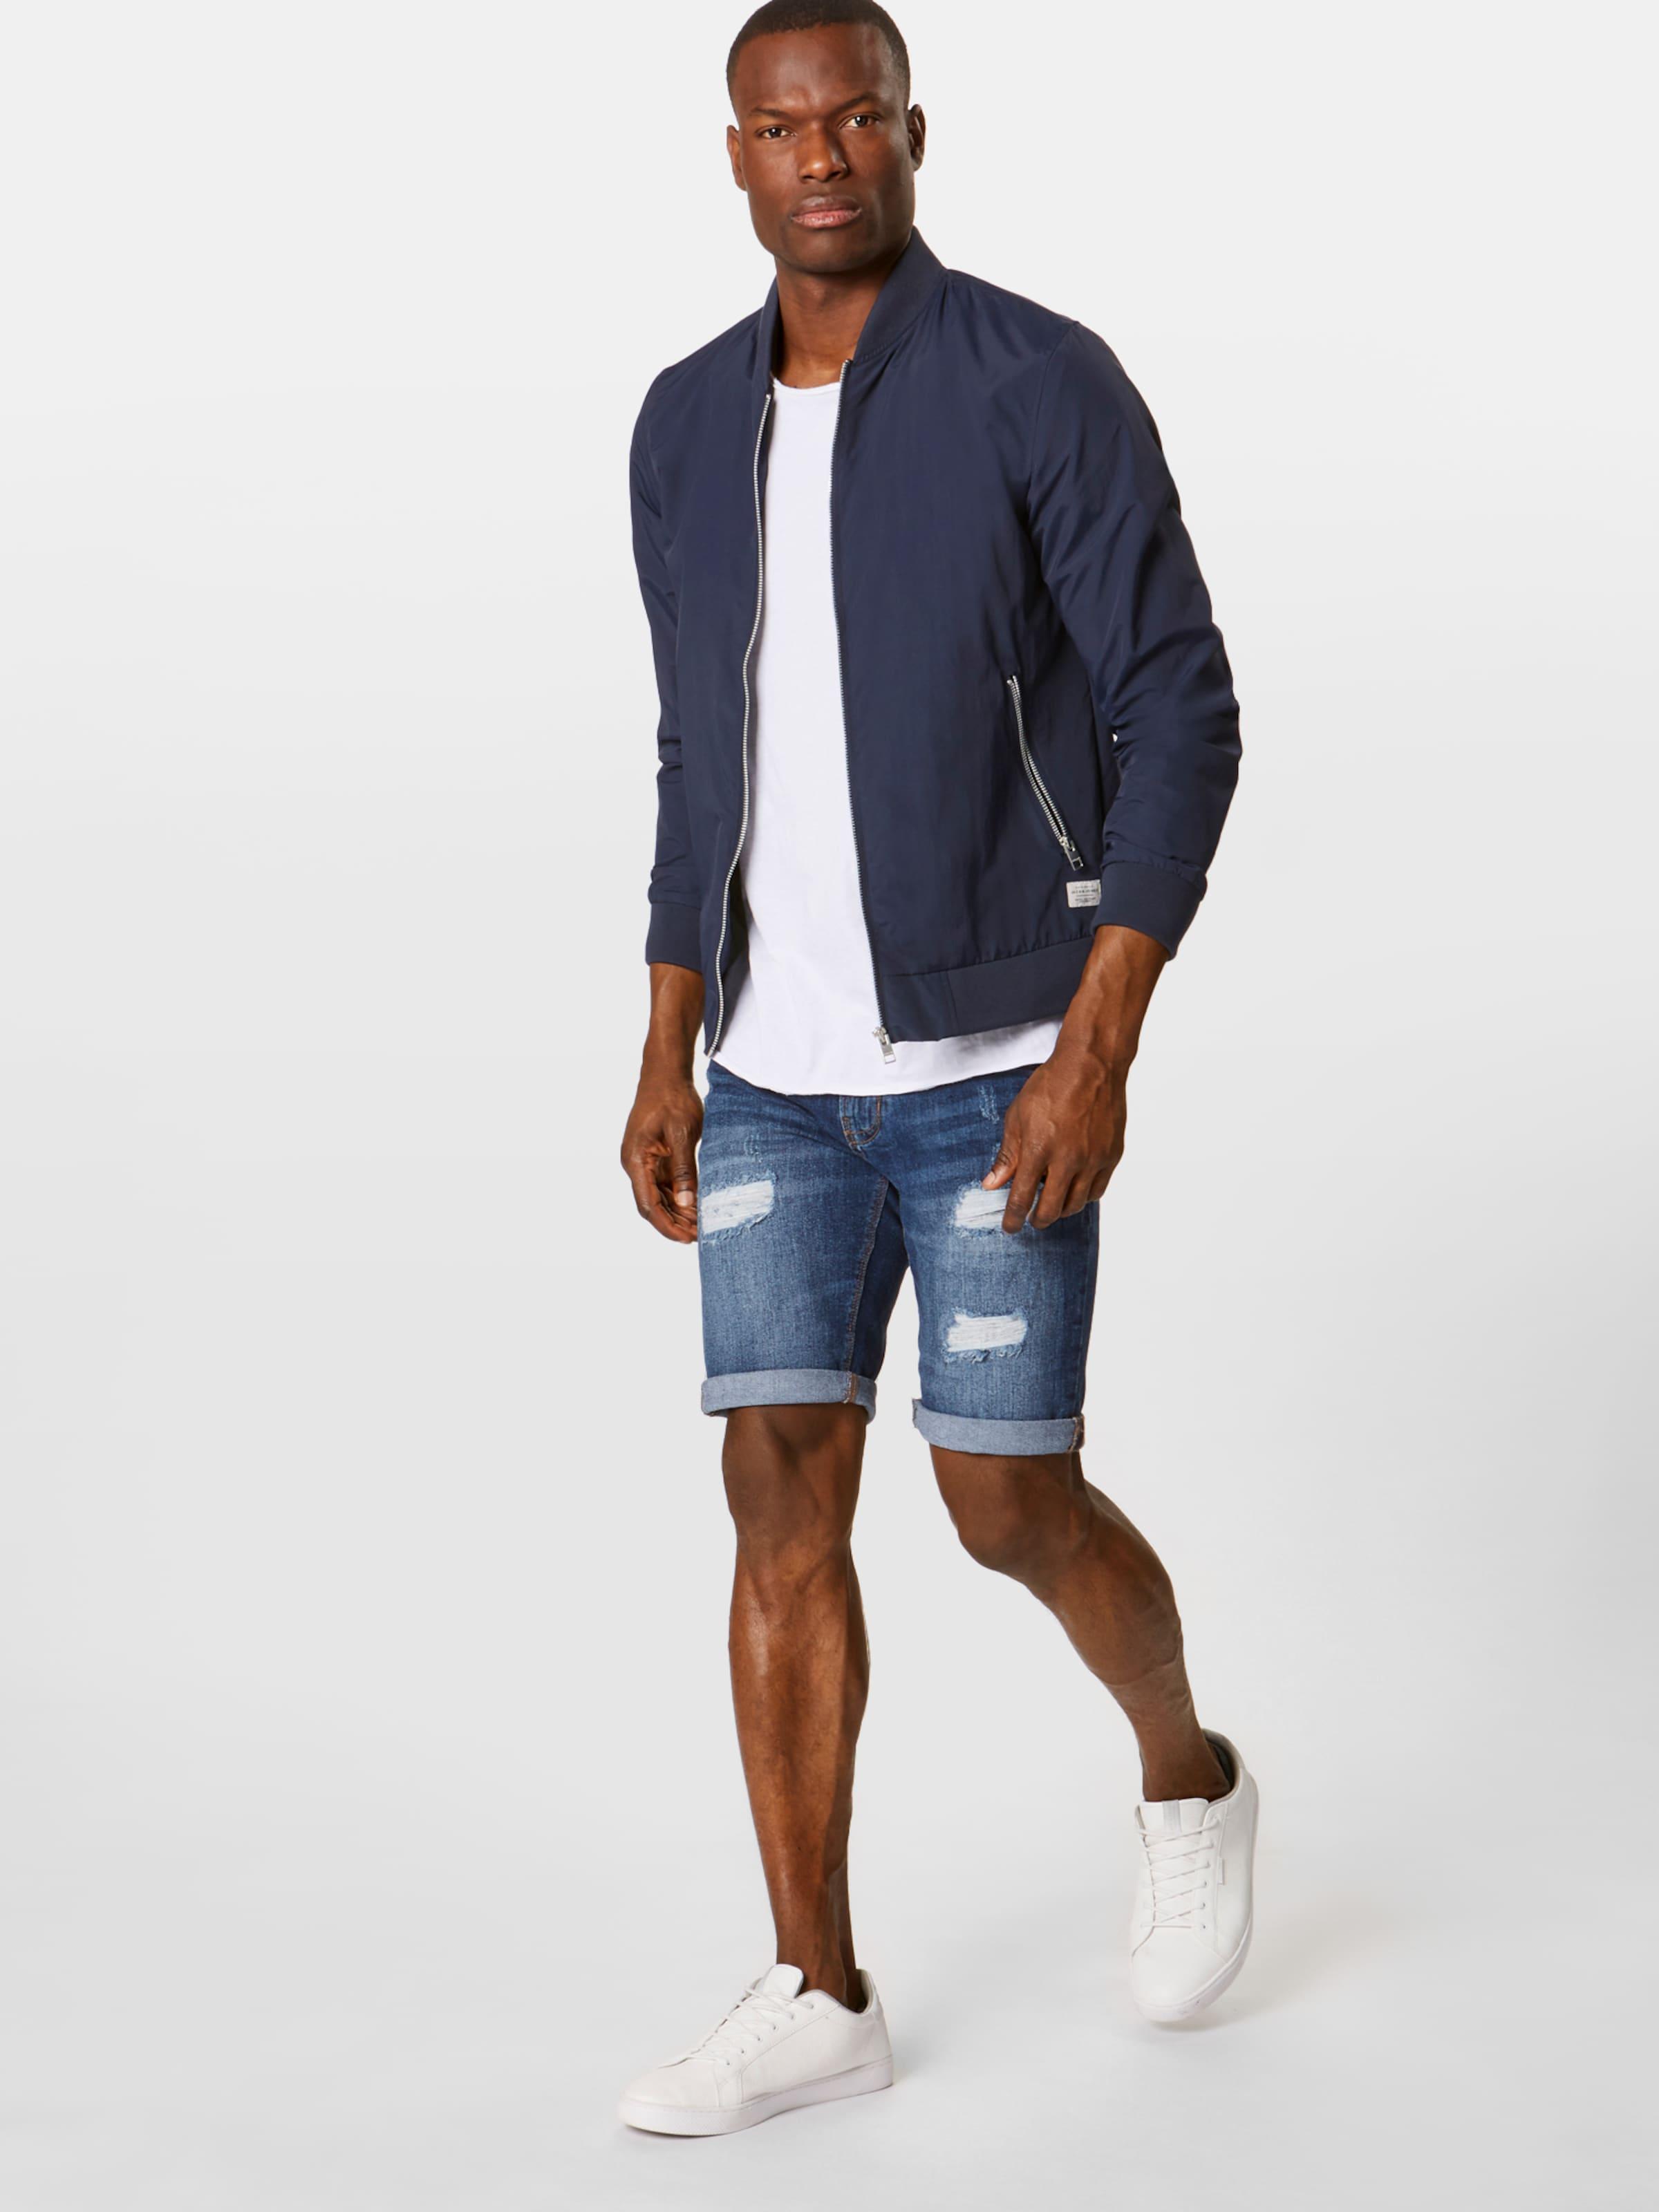 'kaden Jeans Denim In Blue Indicode Holes' oexdCrB